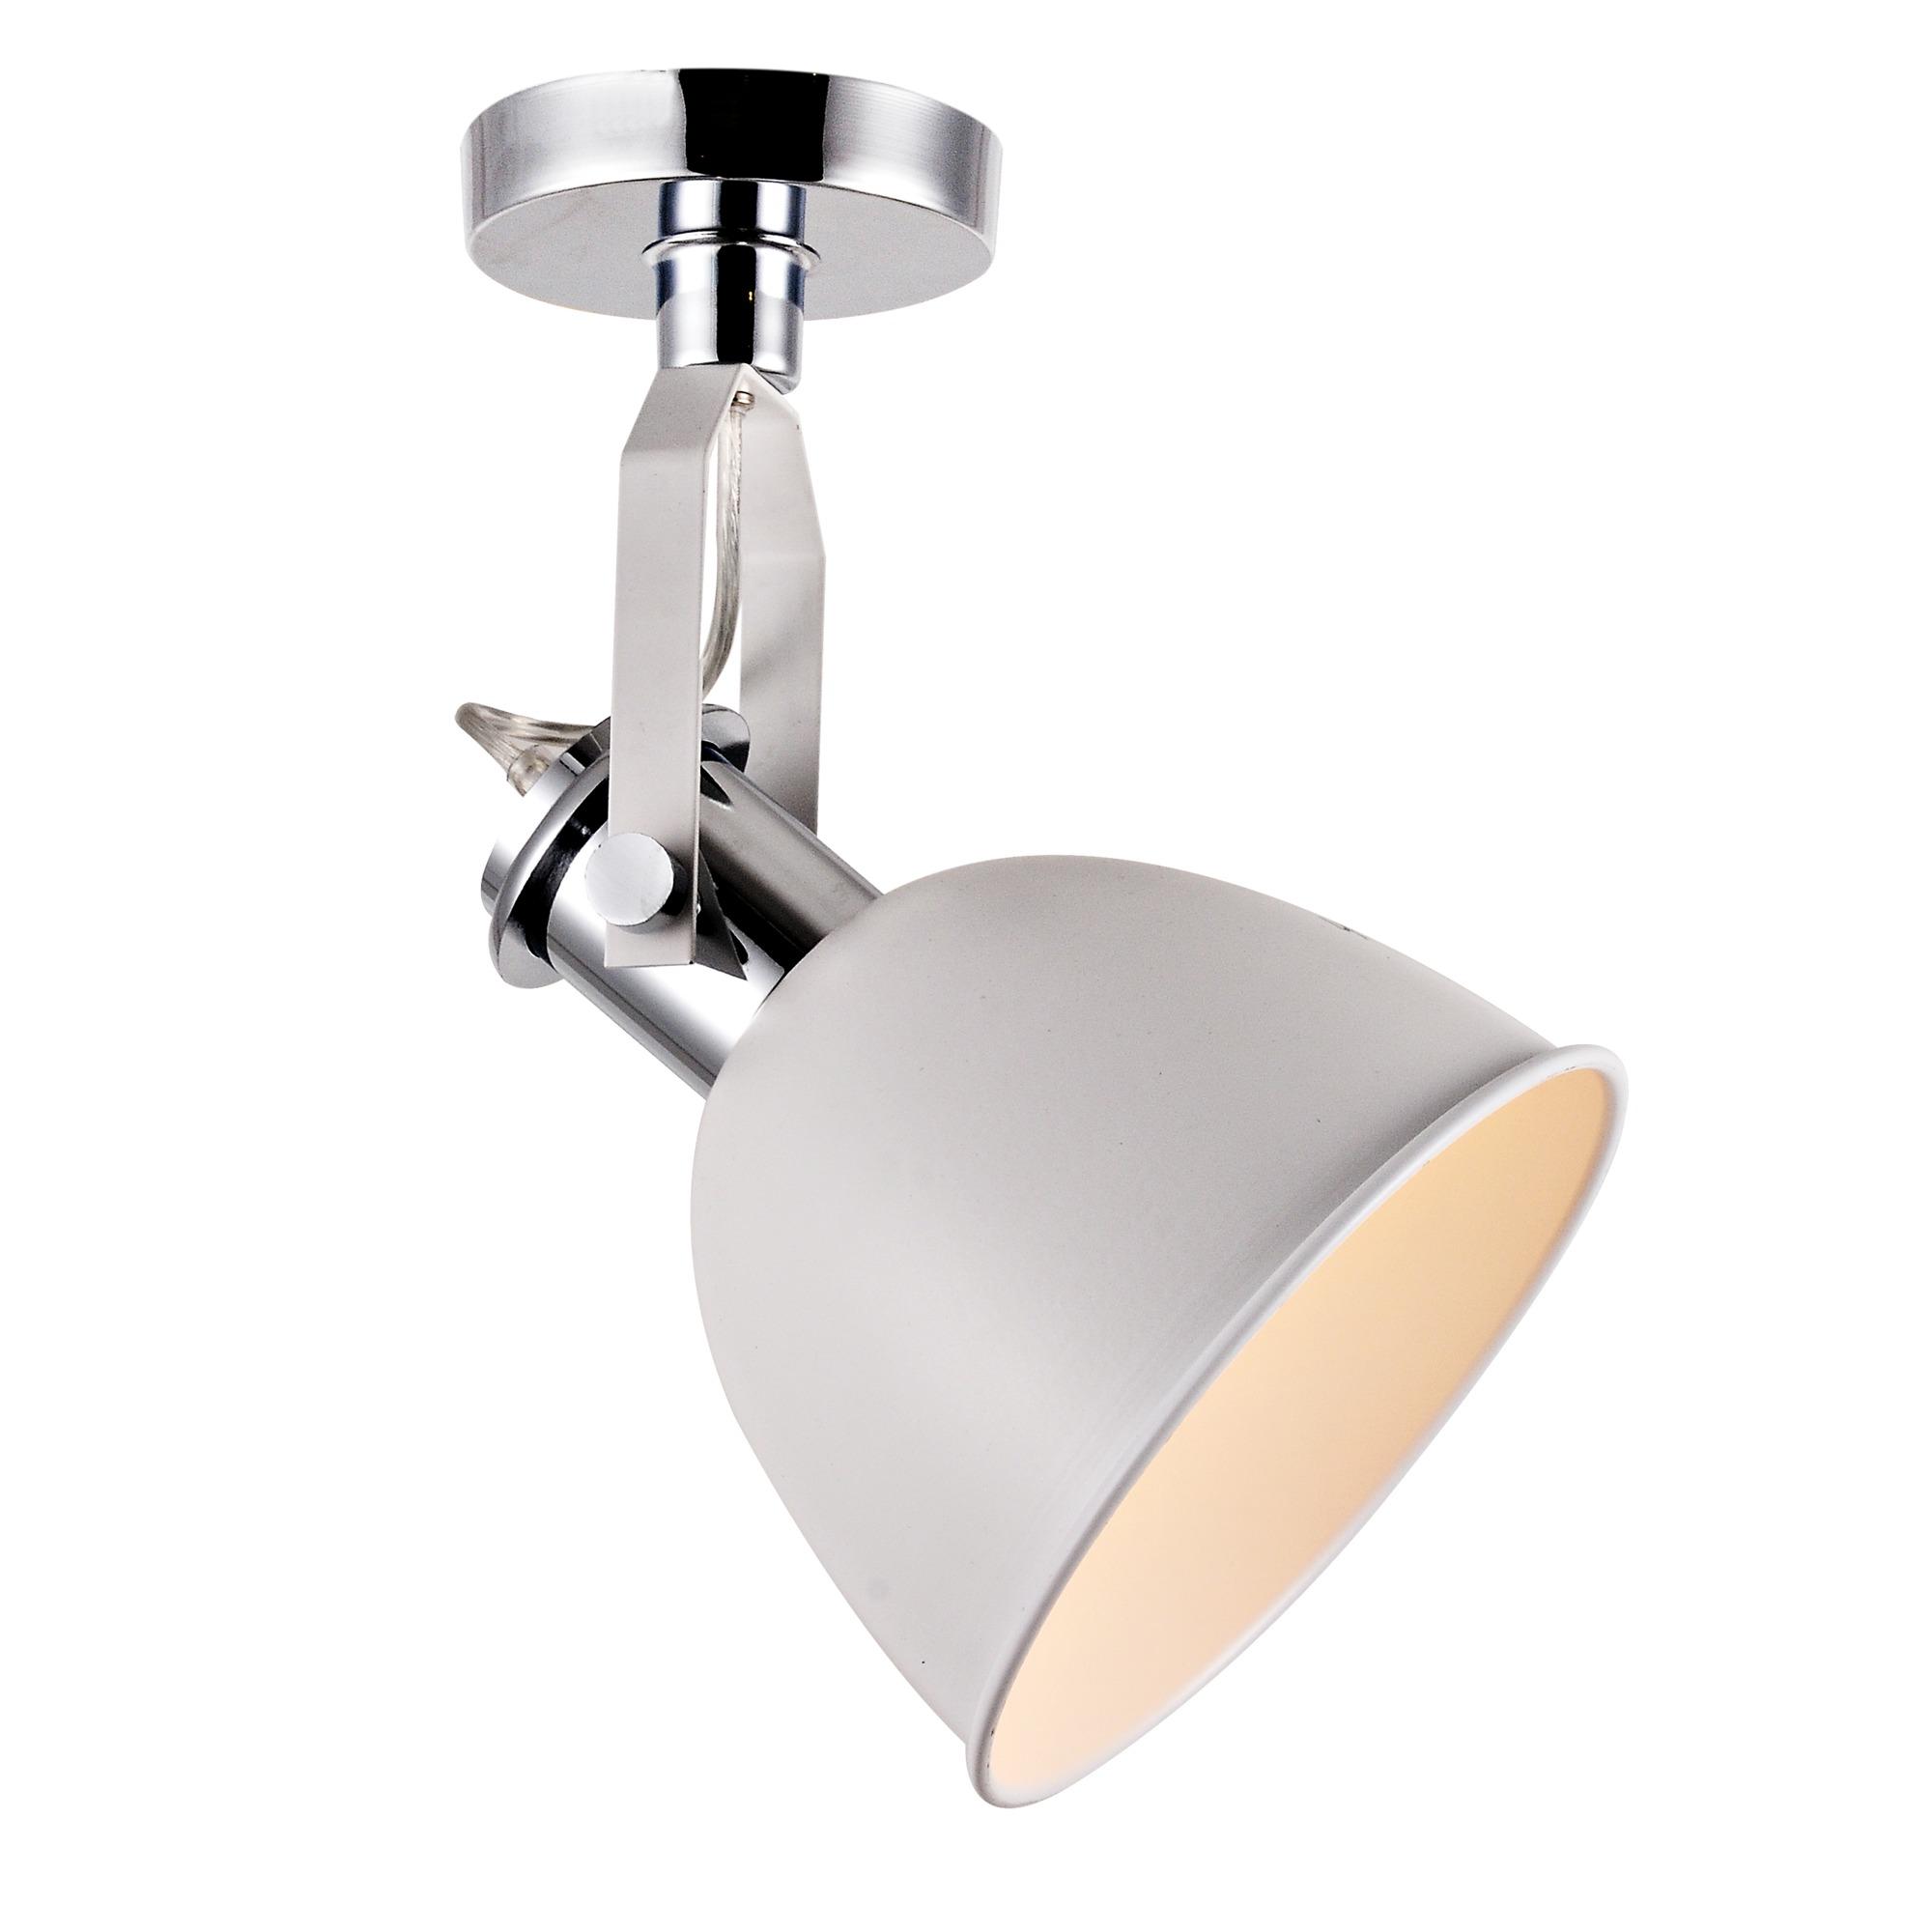 Karwei Plafondlamp Figo Wit Deze Als Spotjes Op De Kast